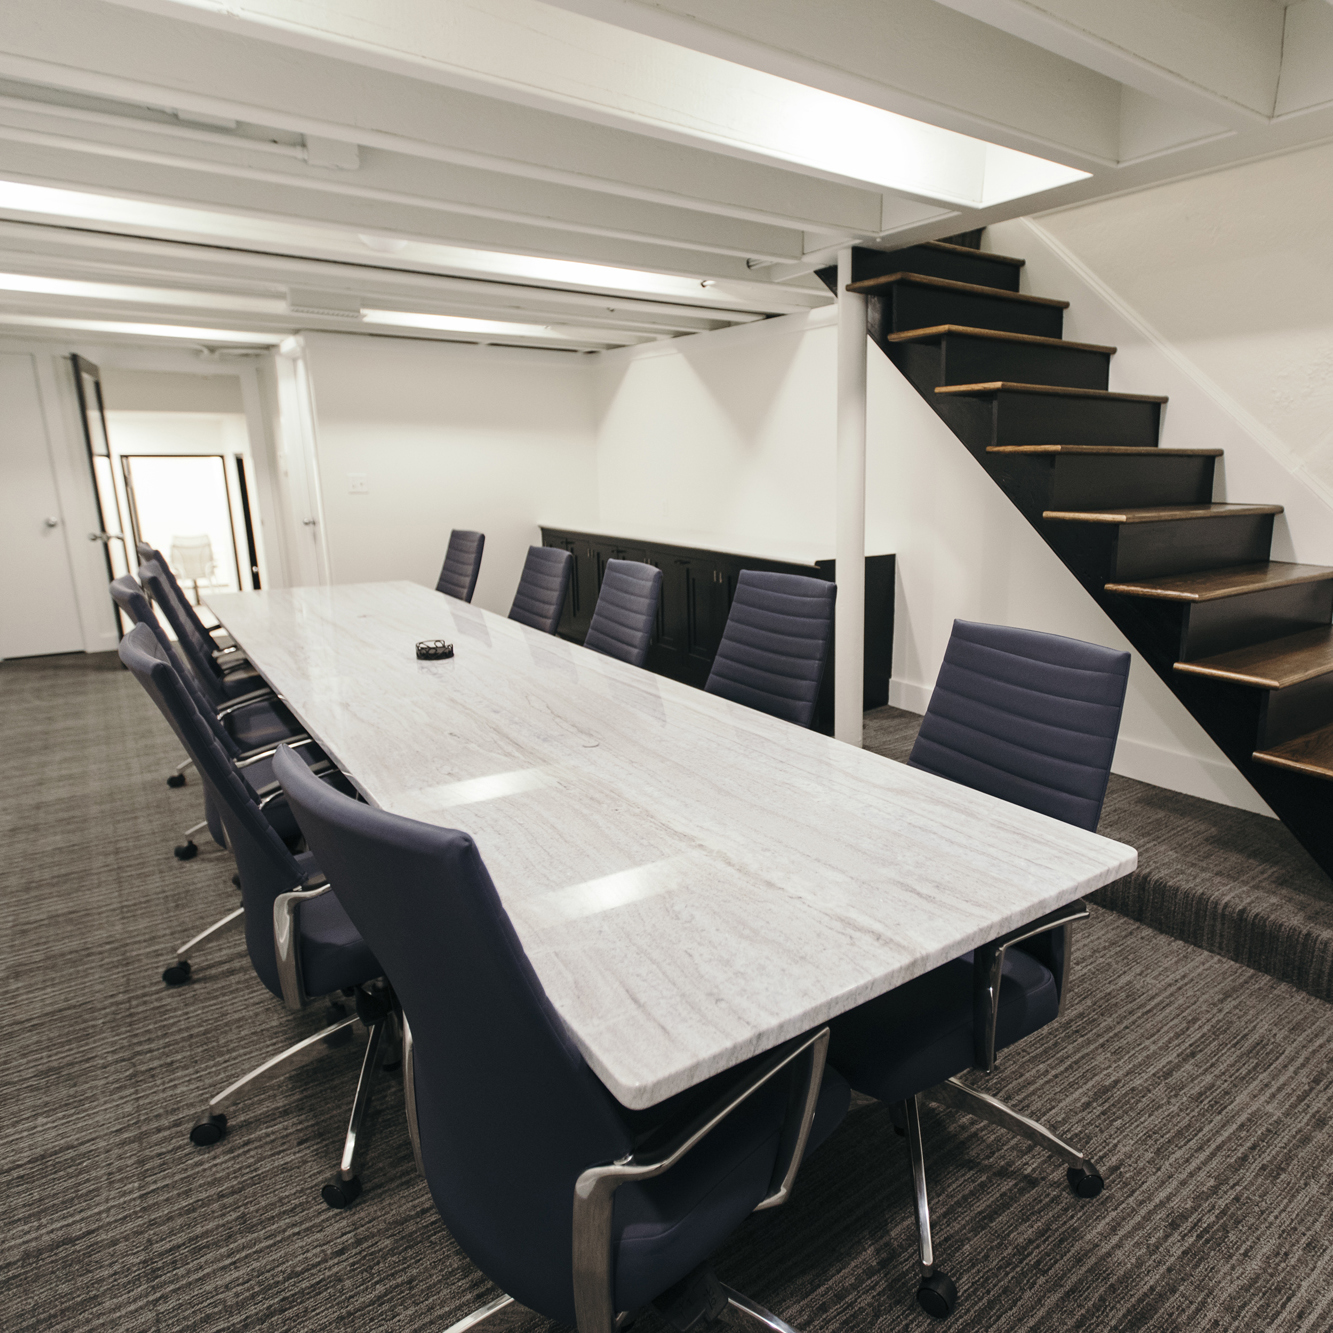 meeting room table furniture